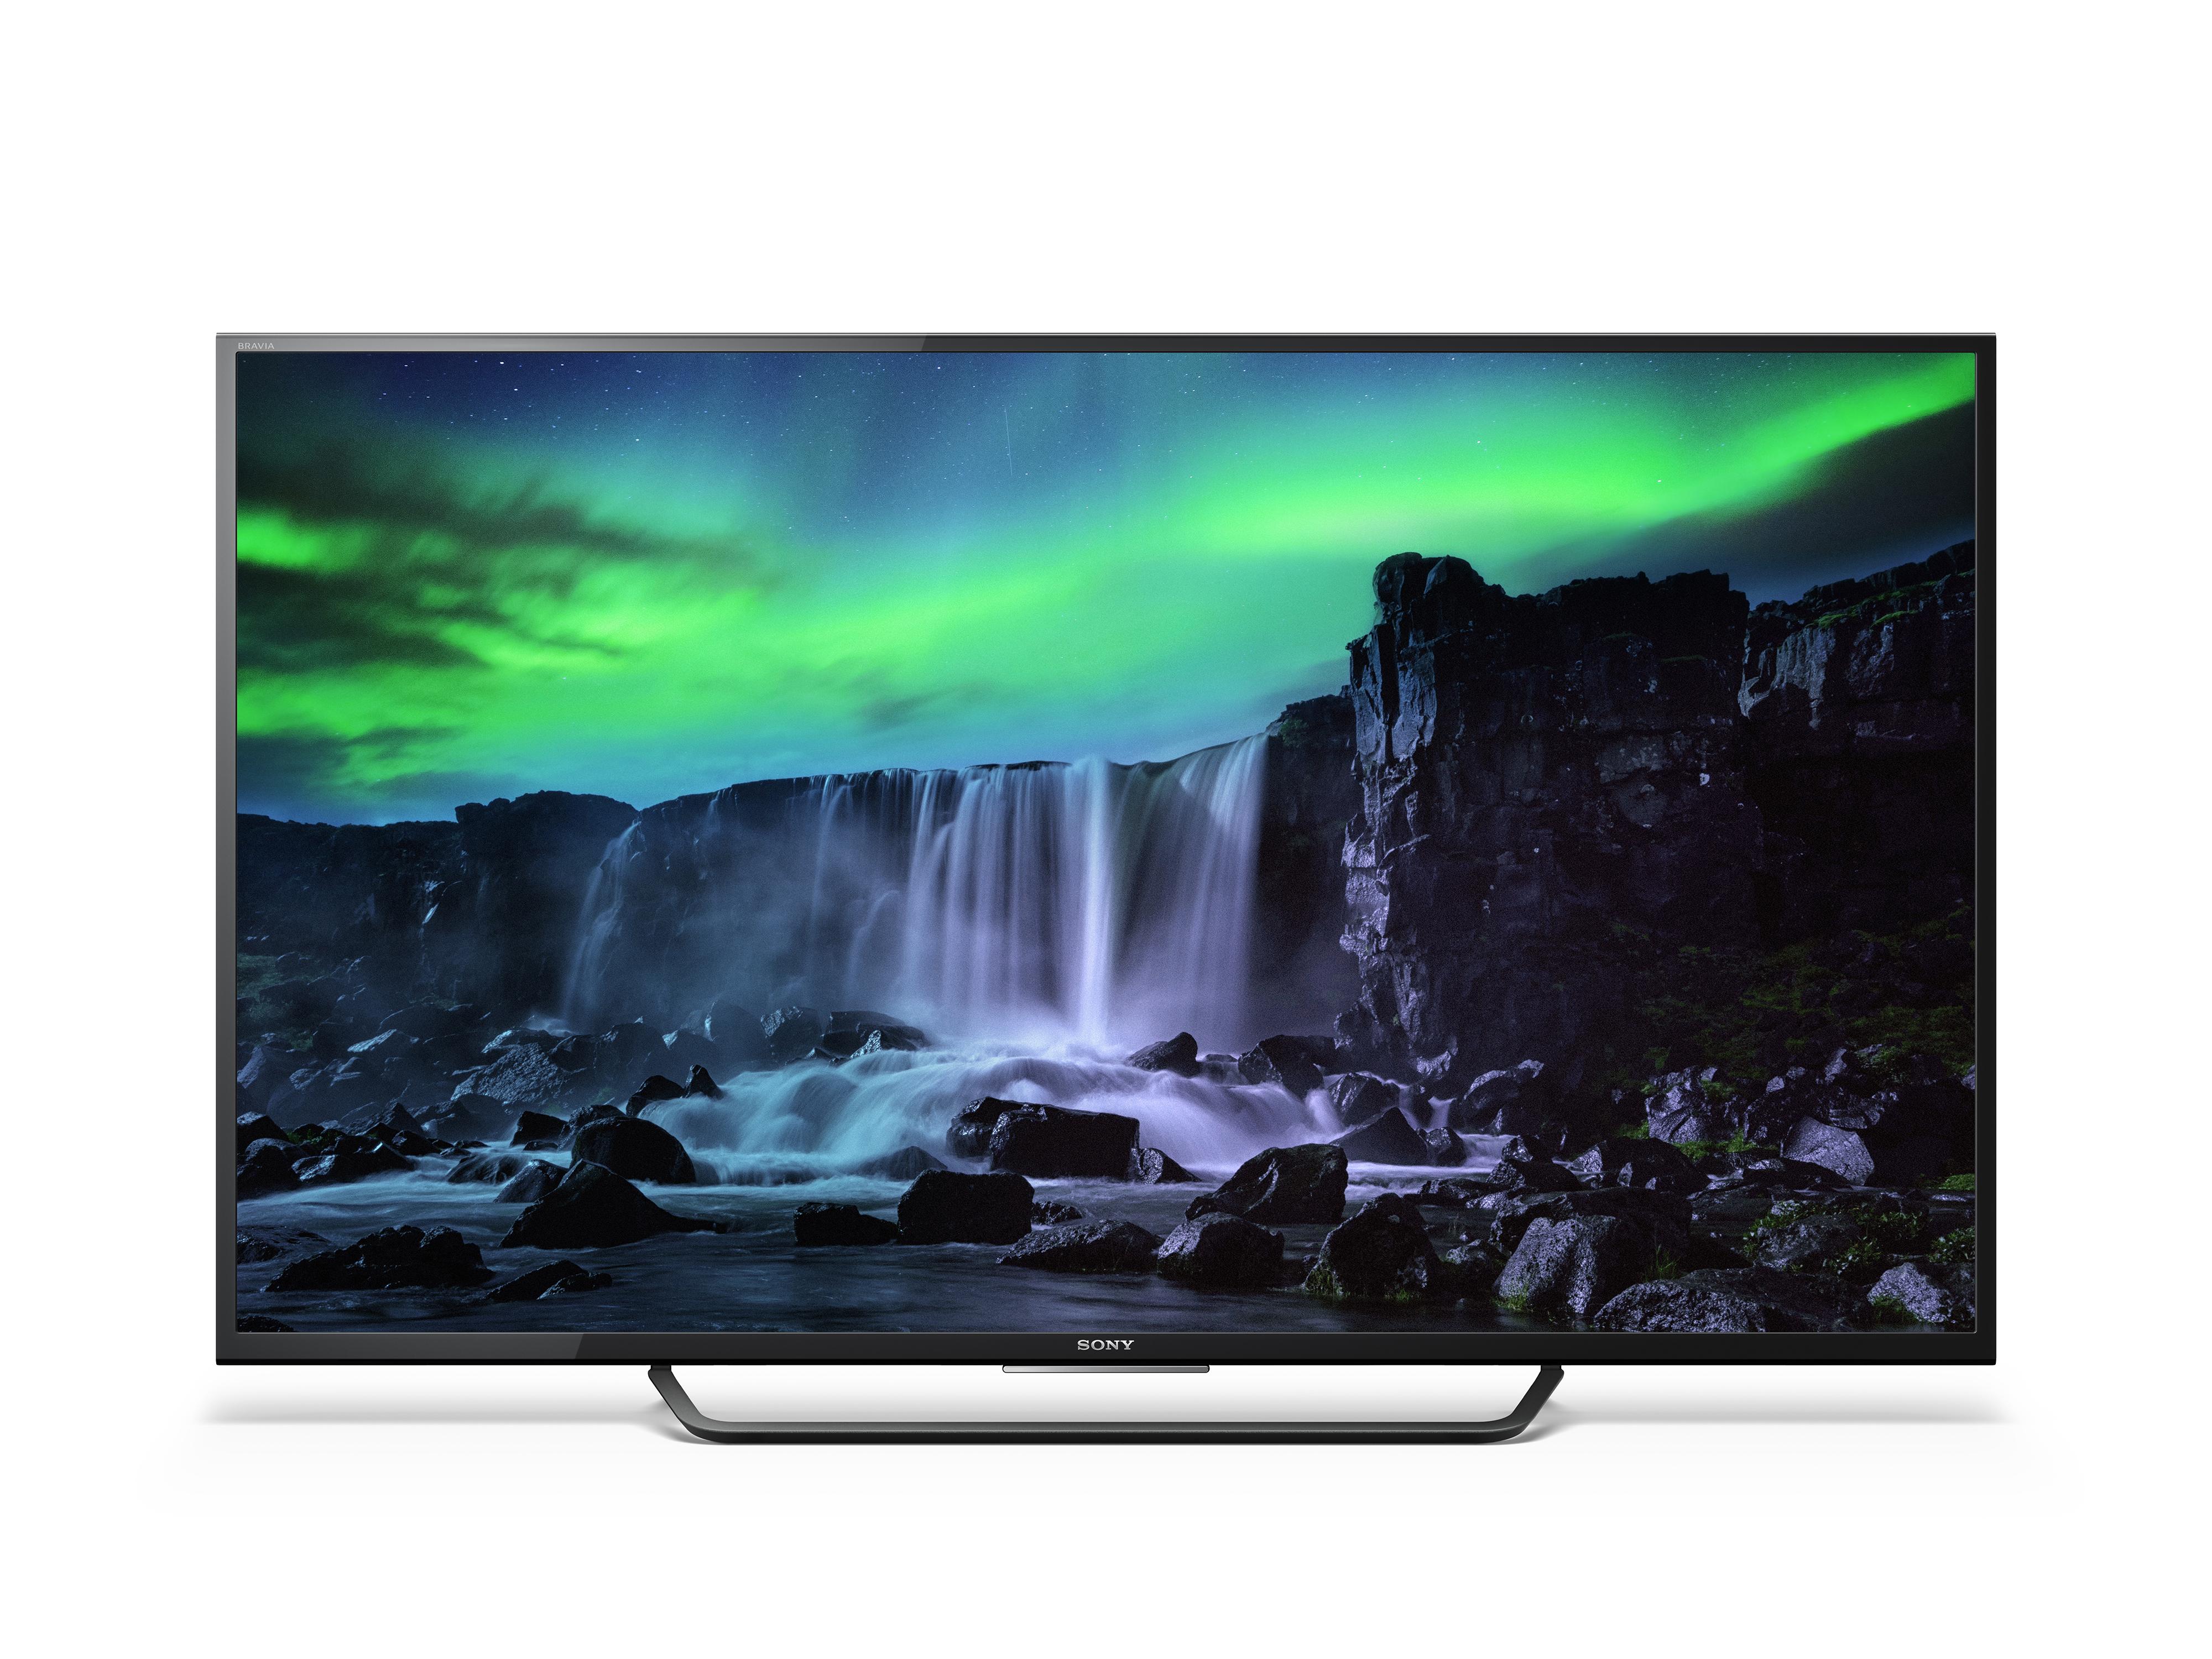 sony bravia xbr x800c series xbr 49x800c 49 led smart tv 4k ultrahd. Black Bedroom Furniture Sets. Home Design Ideas